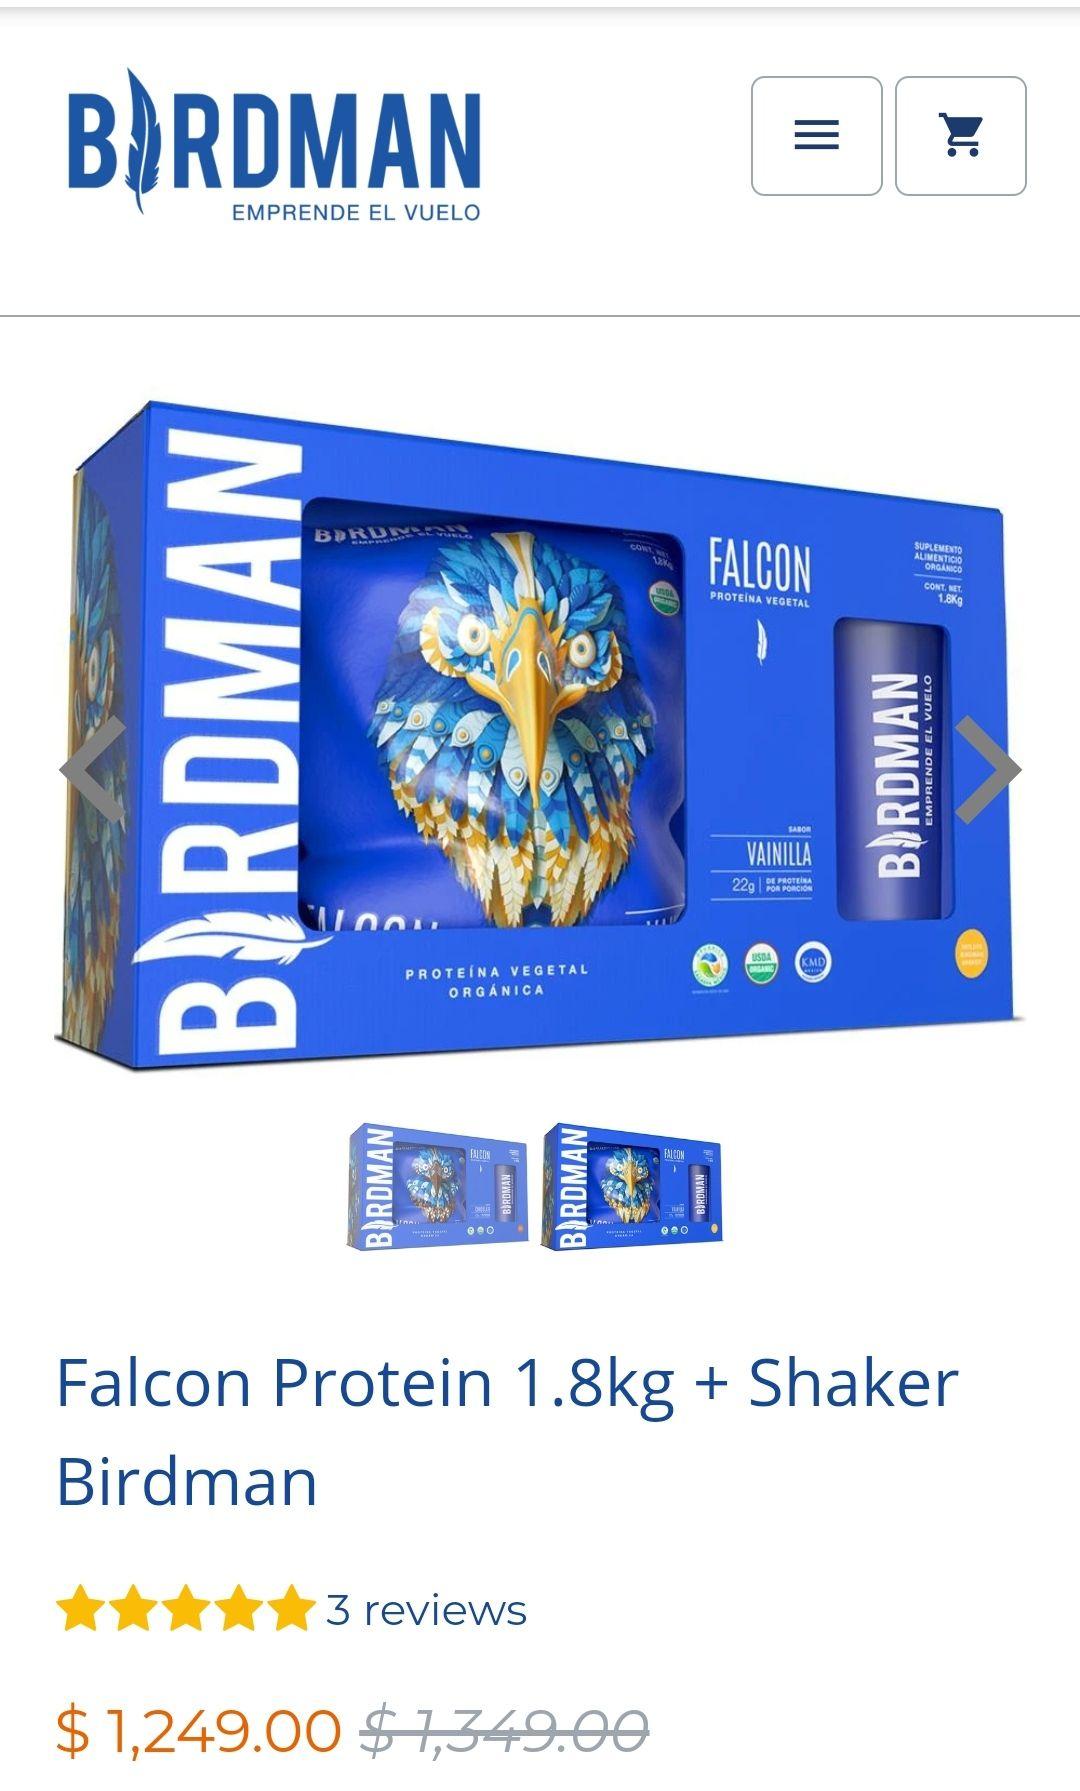 BIRDMAN: Falcon Protein 1.8kg + Shaker Birdman